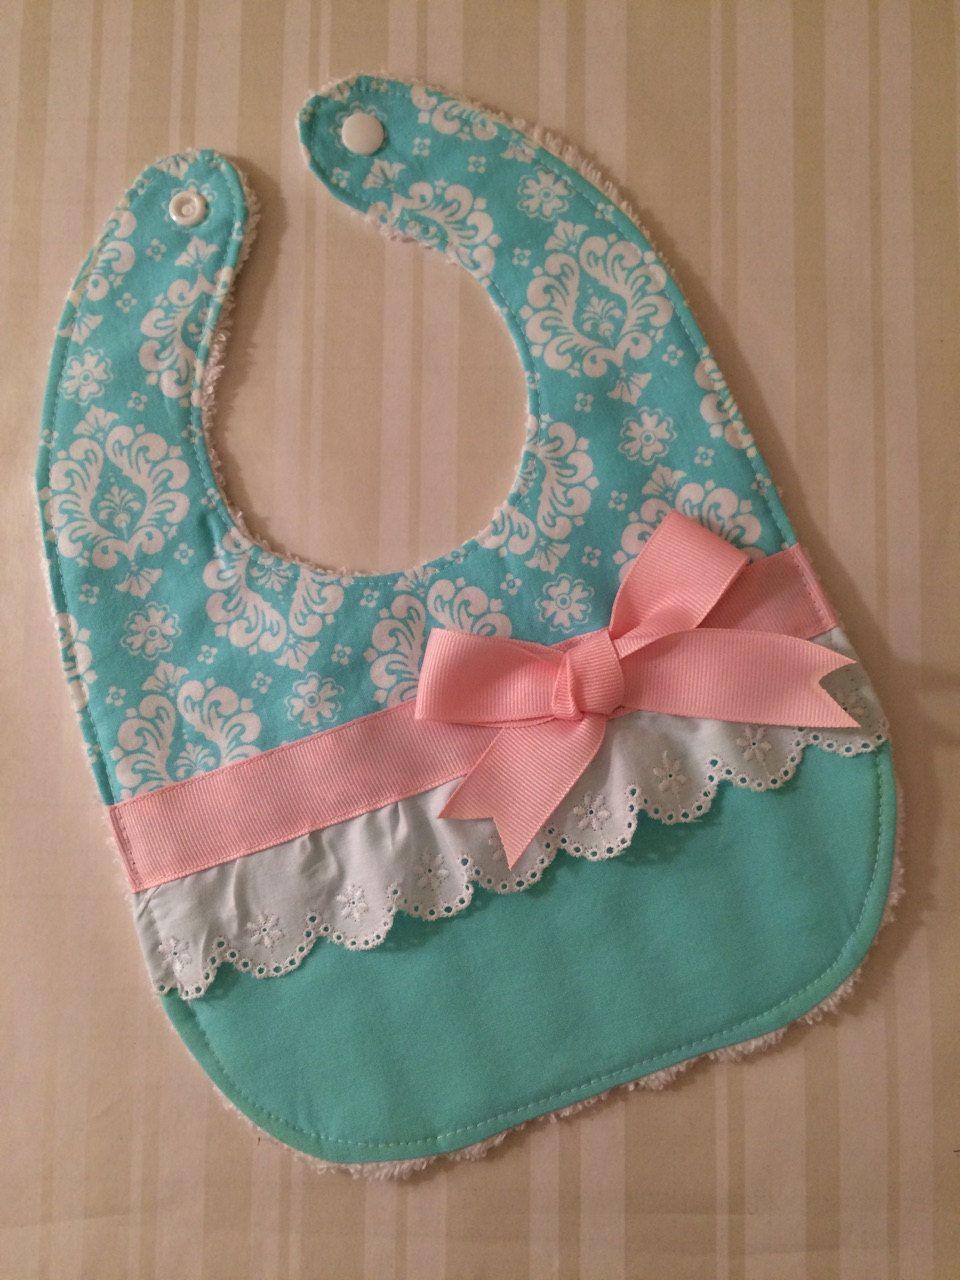 Cute Girl Bib - Aqua, Pink & White Eyelet with Bow - Spring Baby Bib ...